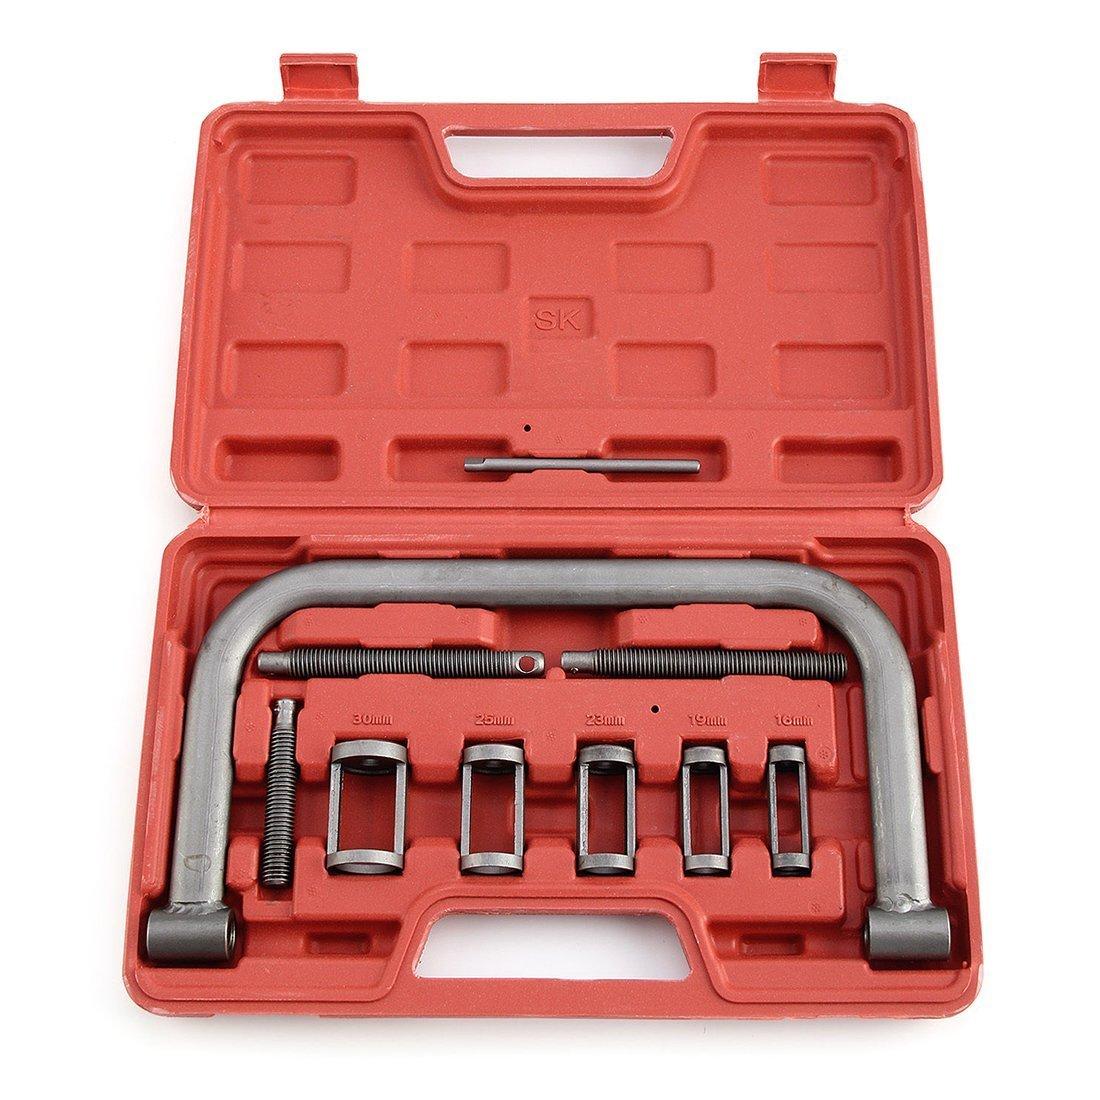 Compressor Tool - TOOGOO(R) 10 pcs Car Motorcycle Valve Spring Compressor Tool Bit Set